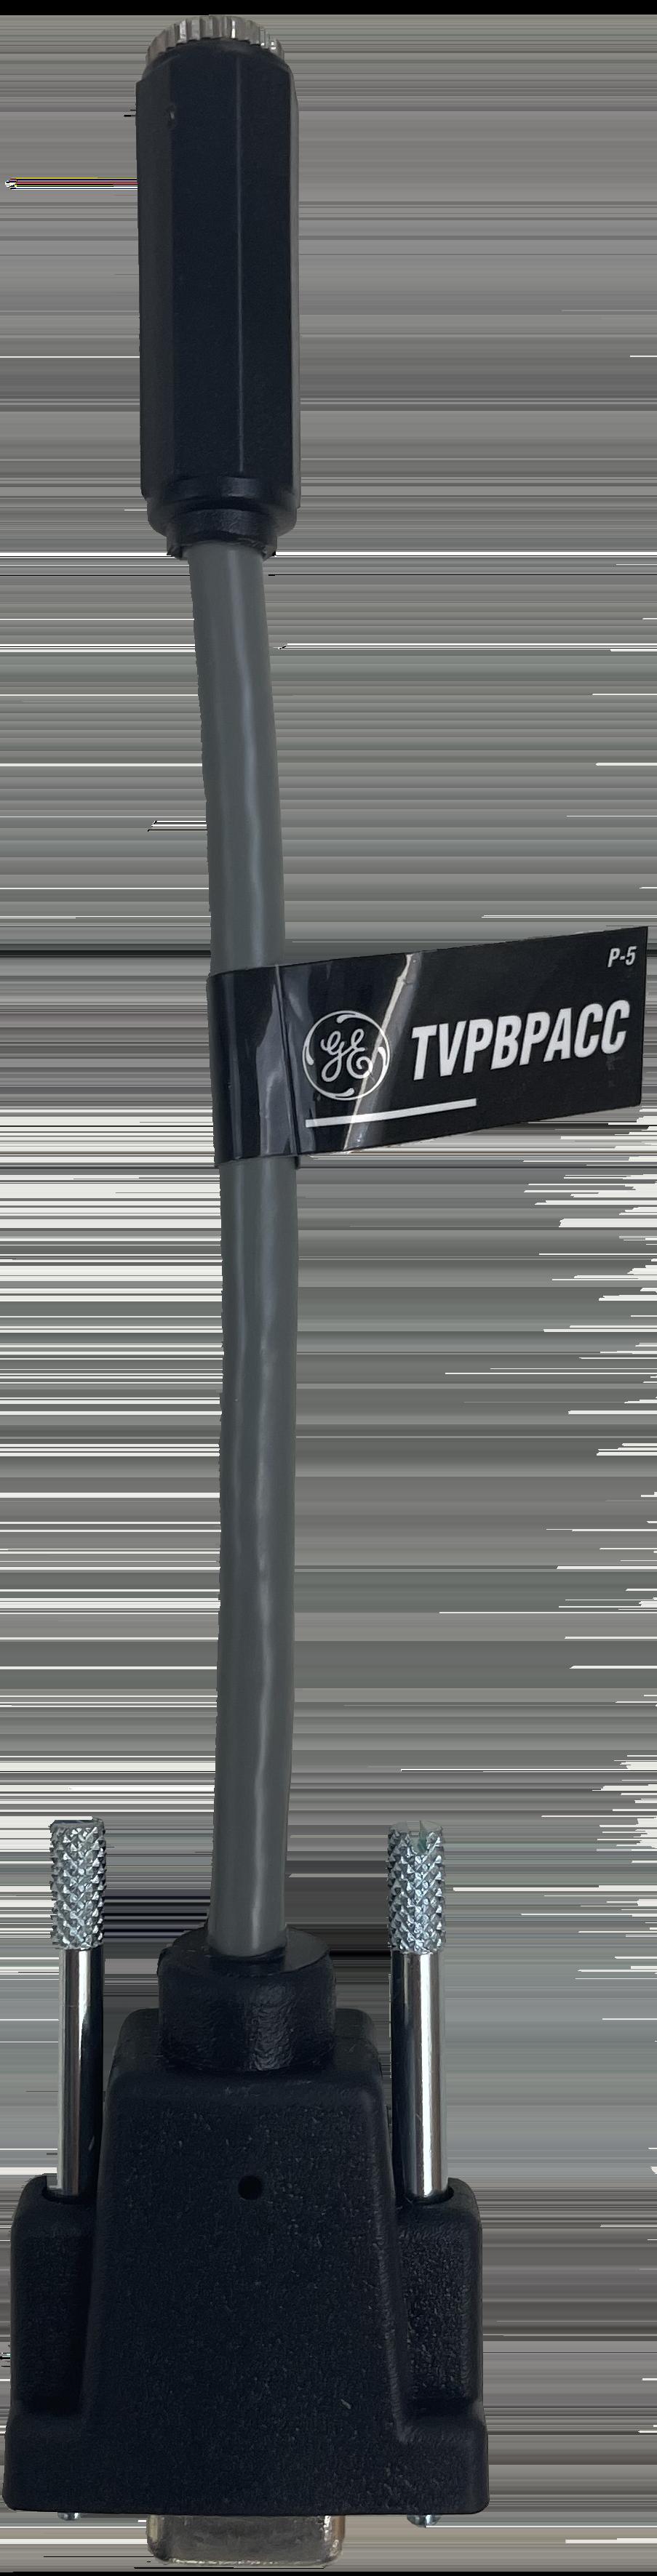 General Electric / GE TVPBPACC